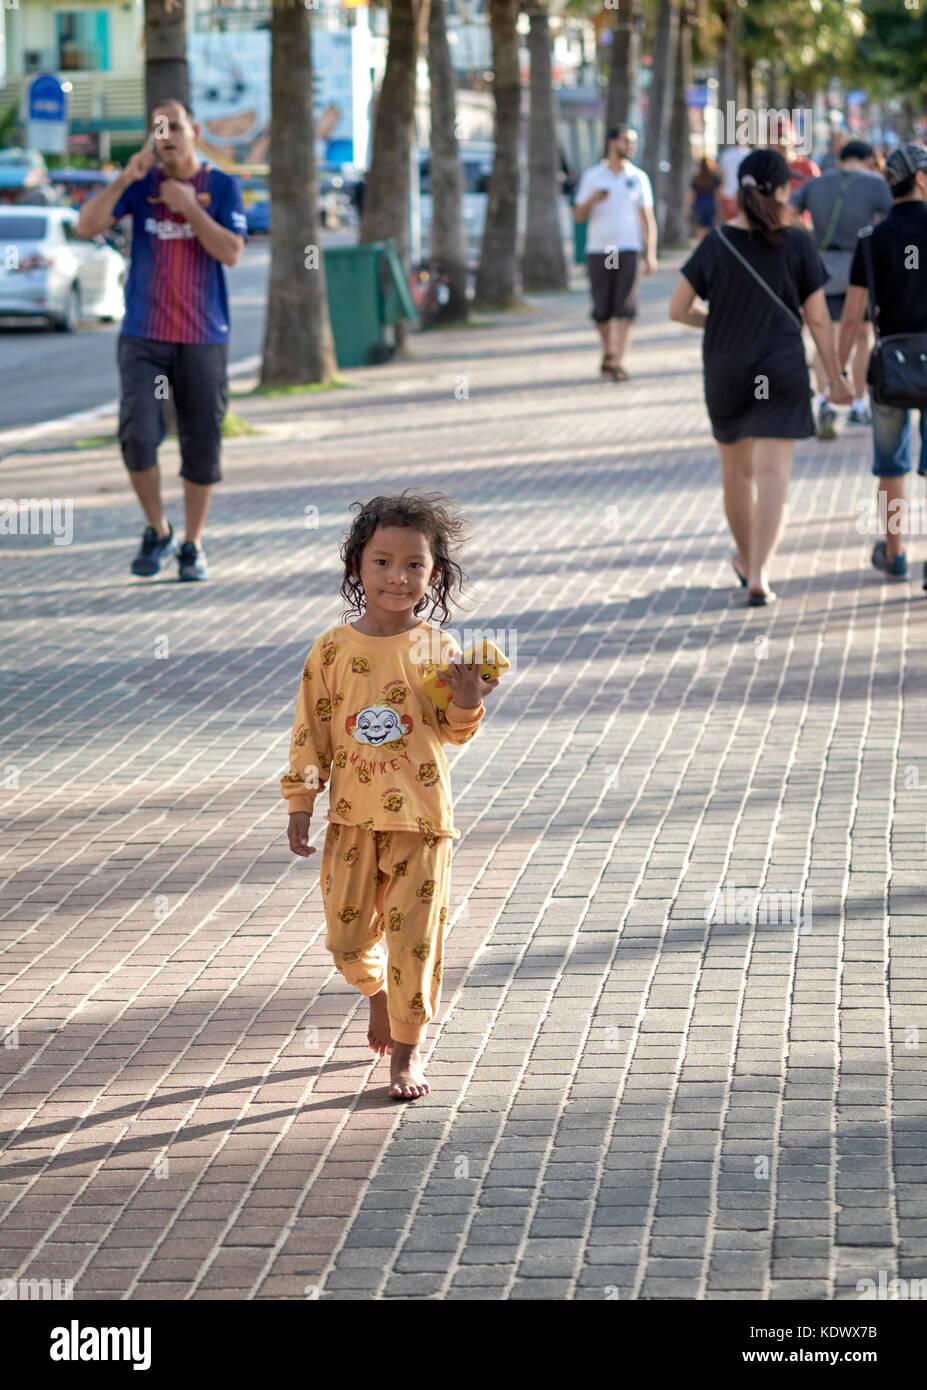 Child alone, playing outside, barefoot, bare feet, street, pavement, sidewalk, Thailand, Southeast Asia - Stock Image